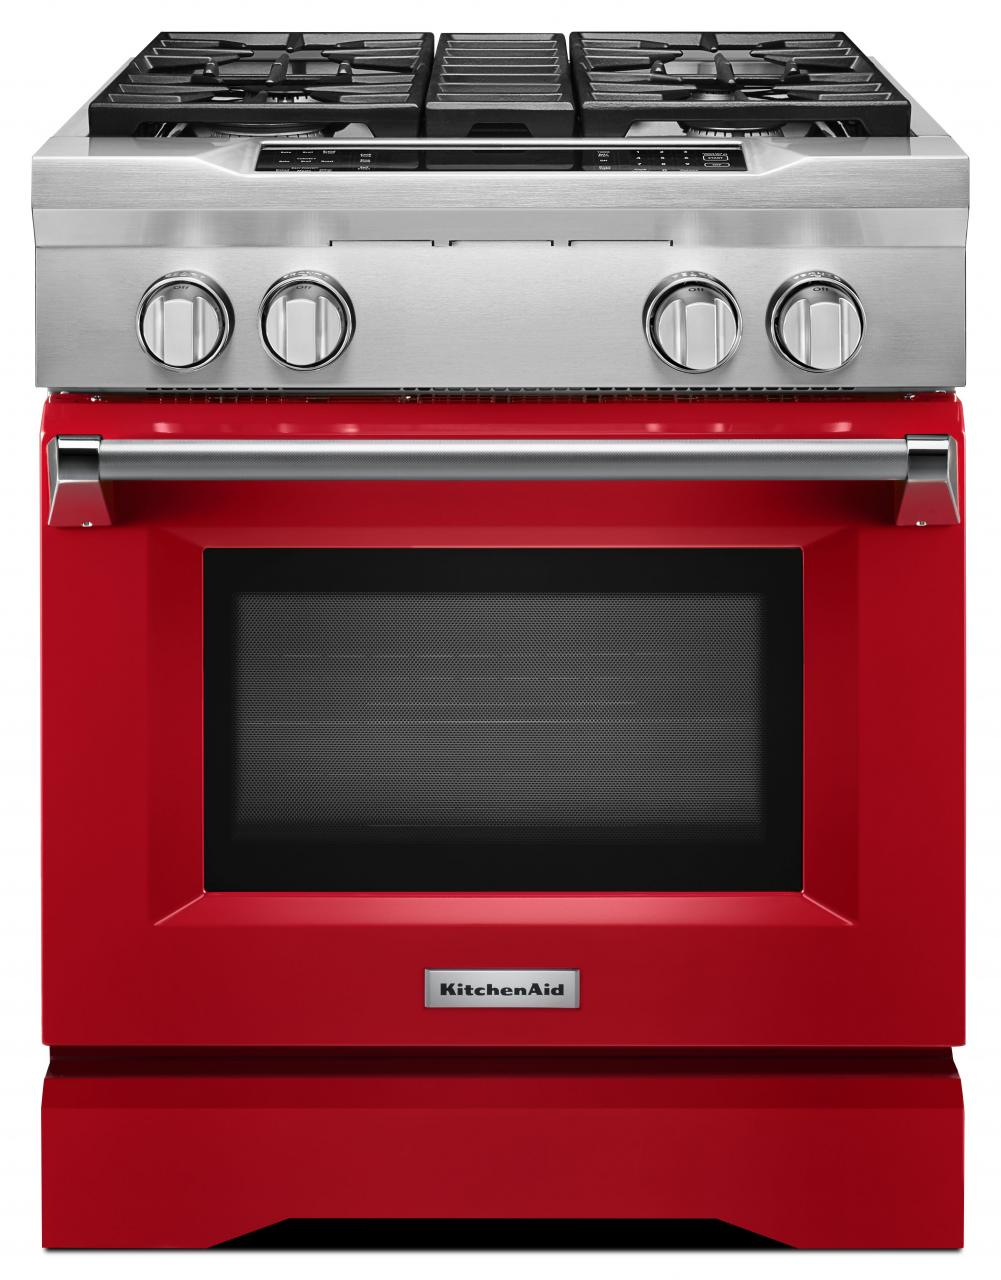 Kitchenaid Commercial Style 30 Pro Dual Fuel Range Signature Red Kdrs407vsd